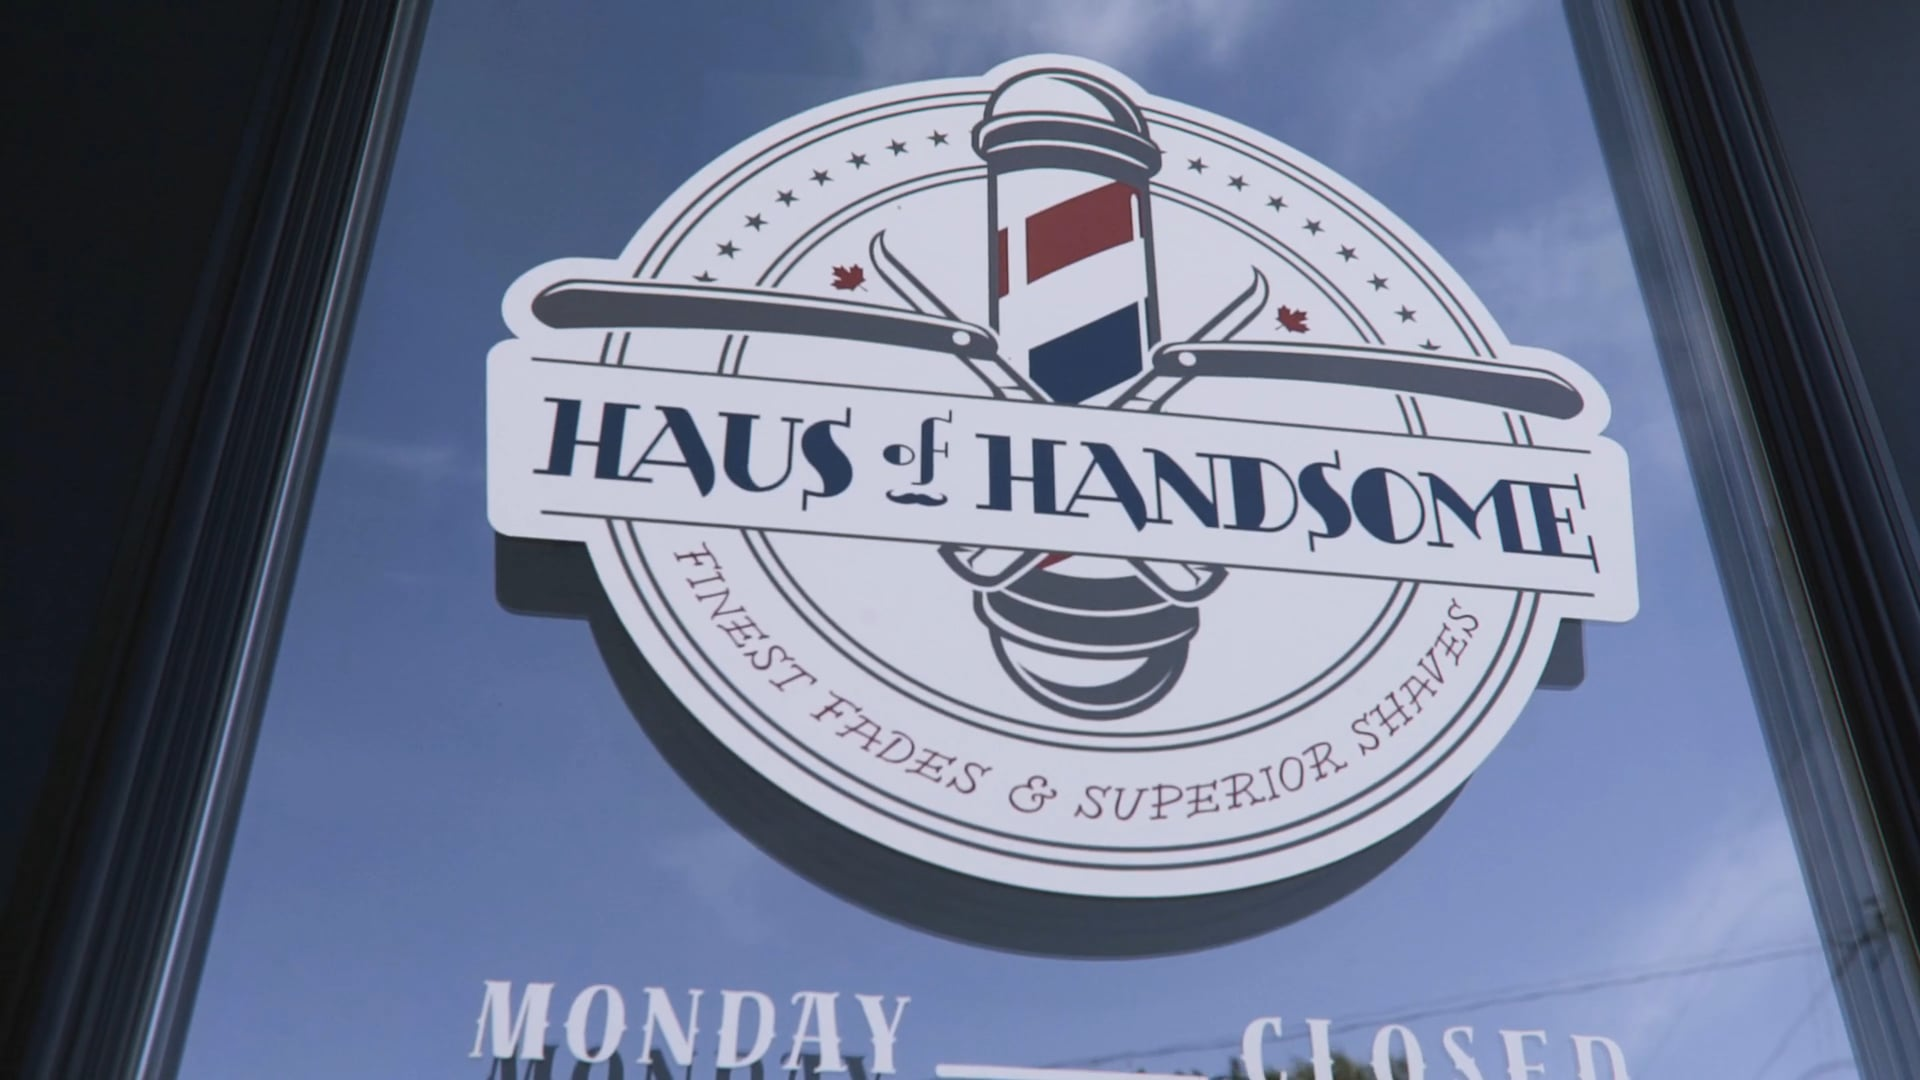 Haus of Handsome